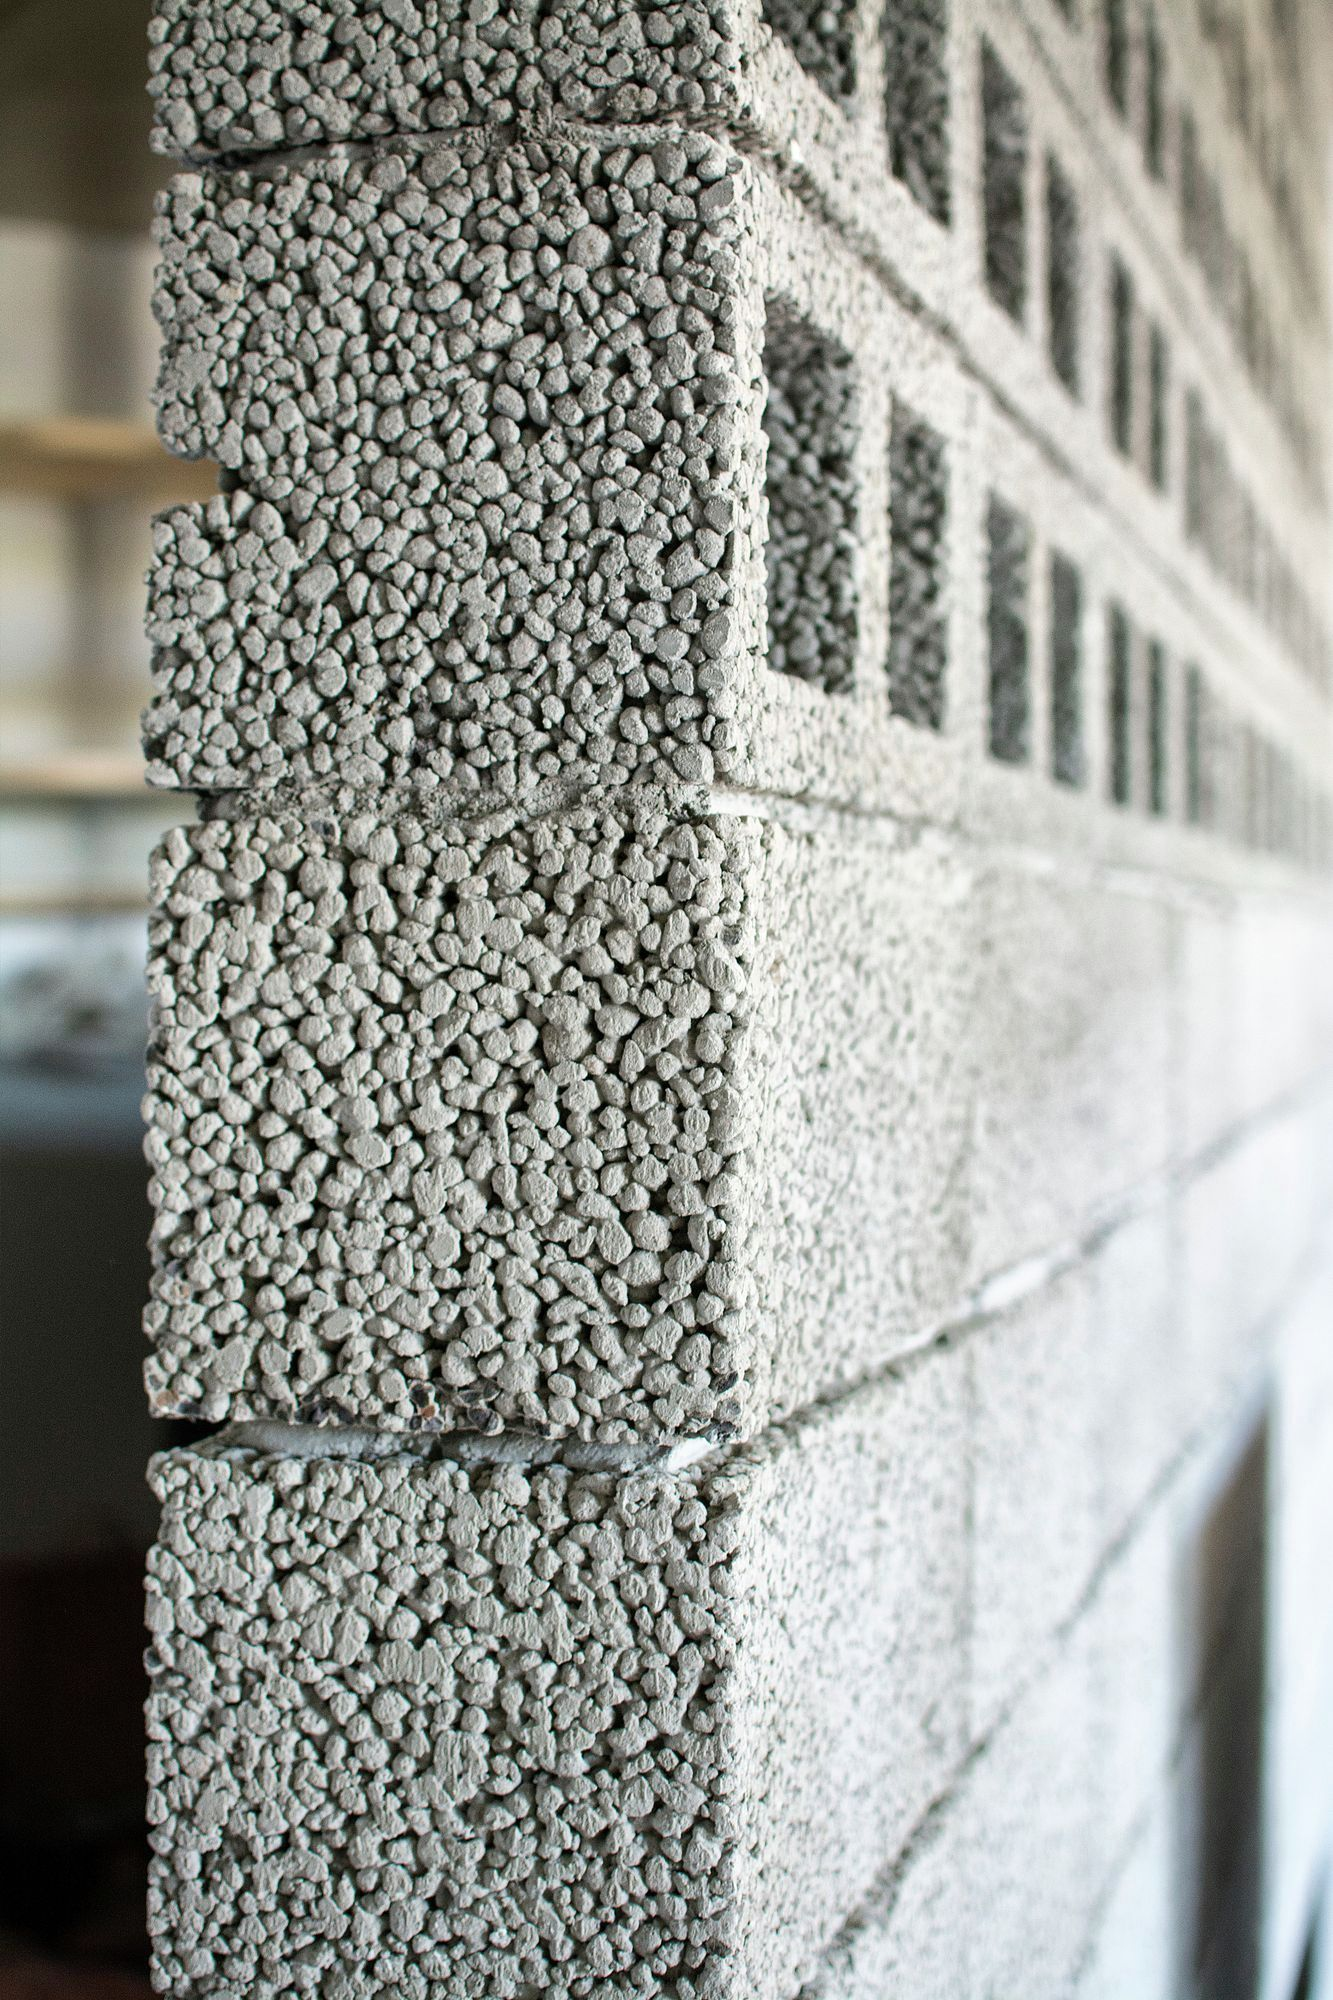 St. Petersburg concrete wall divider texture